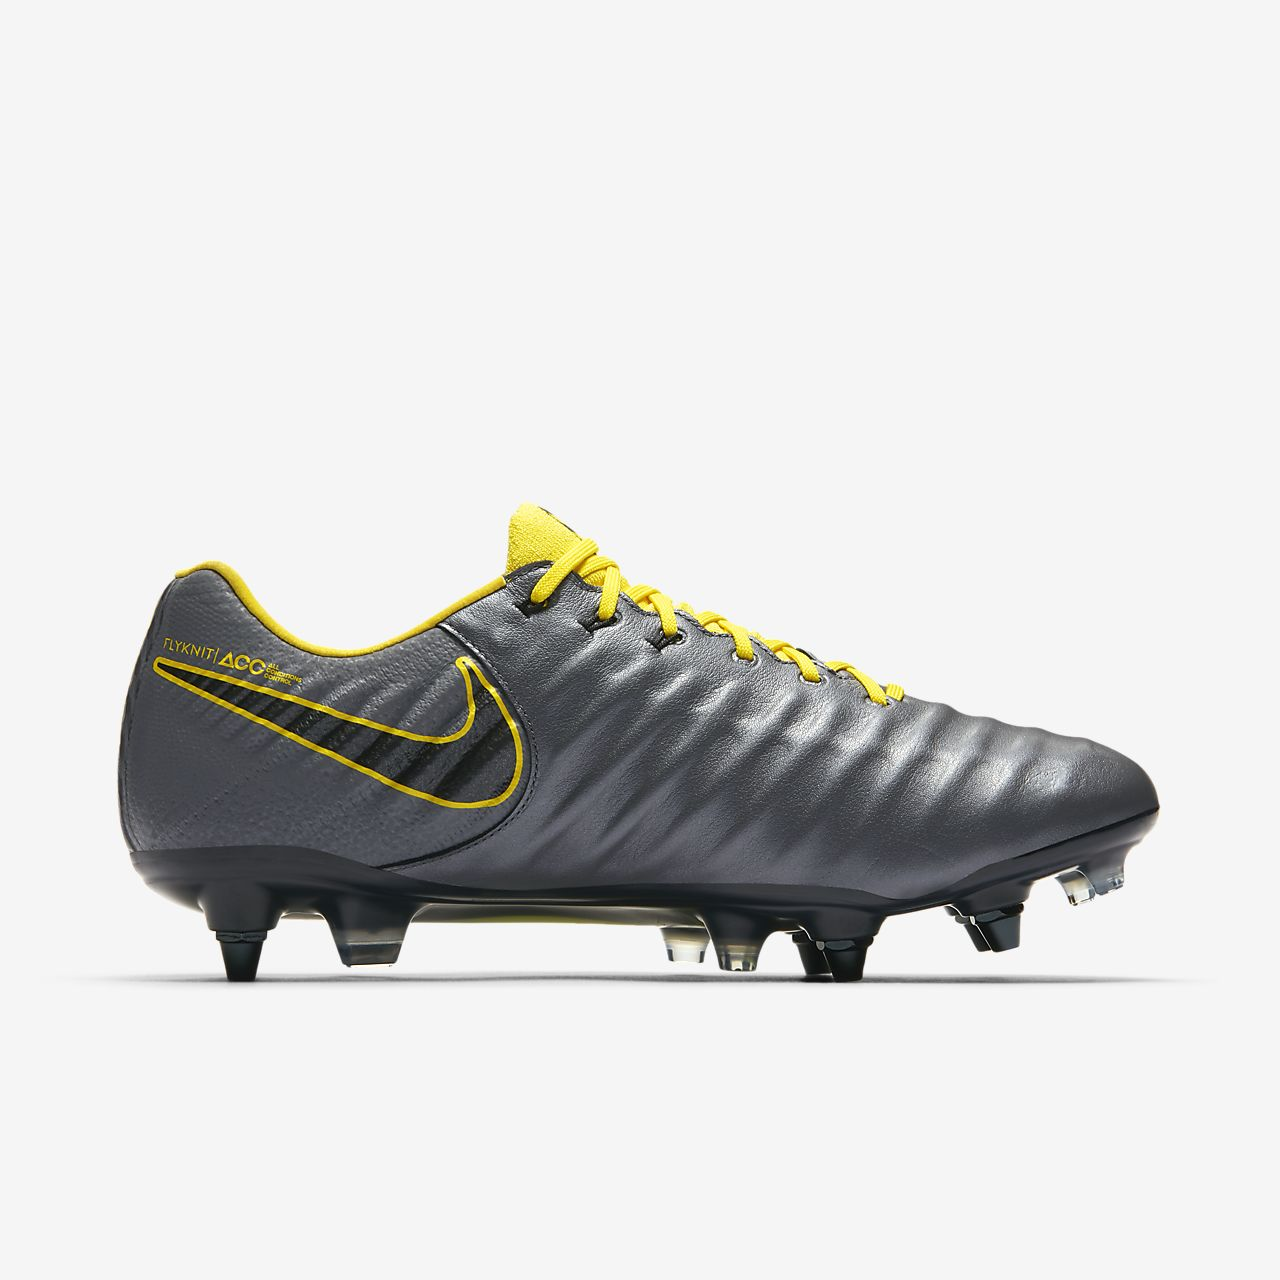 93a4c6fcc6f ... Nike Tiempo Legend VII Elite SG-Pro Anti-Clog Soft-Ground Football Boot